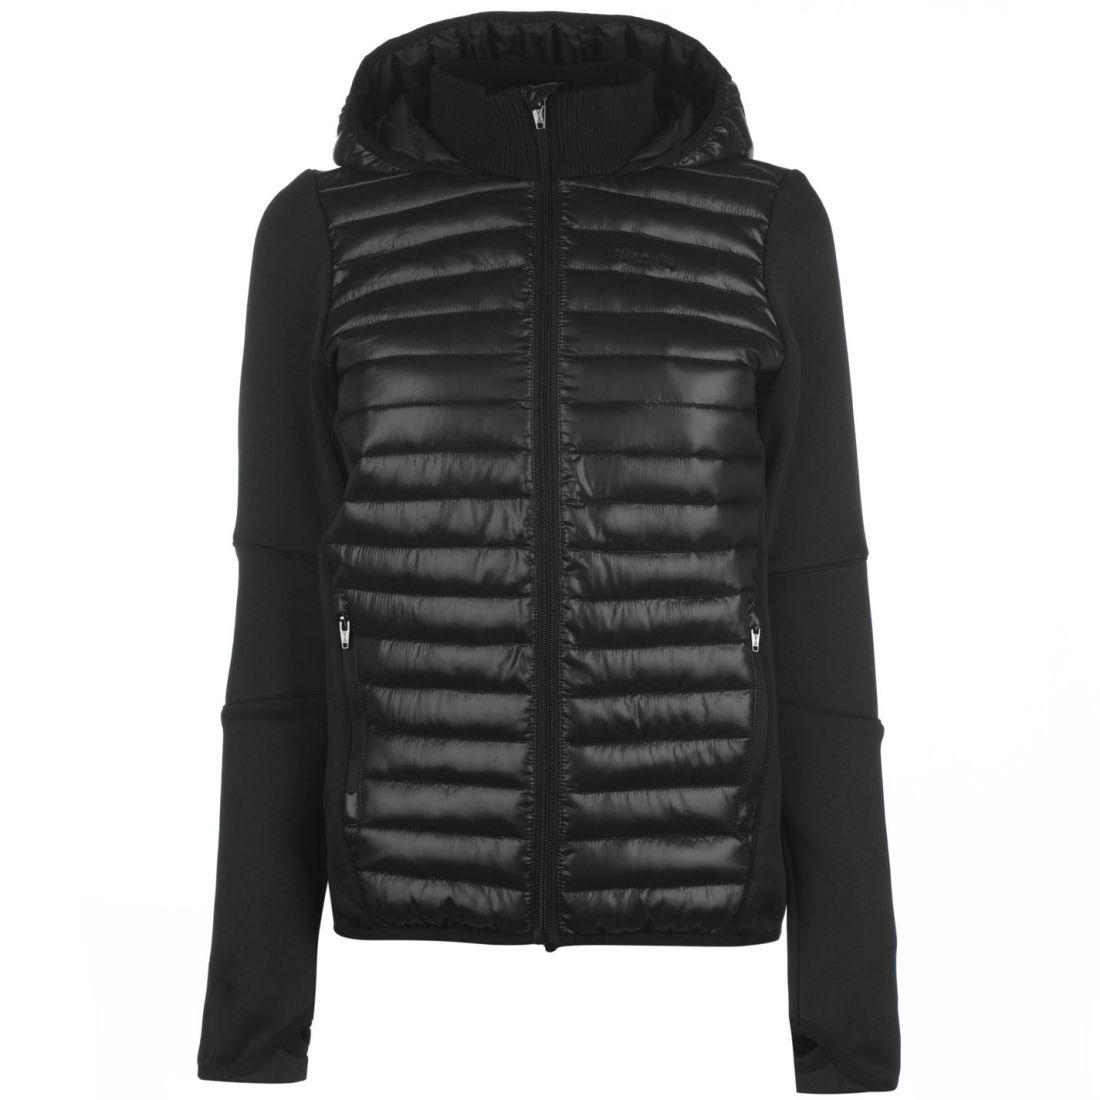 b343b51ae USA Pro Womens Hybrid Jacket Puffer Coat Top Lightweight Hooded Zip ...